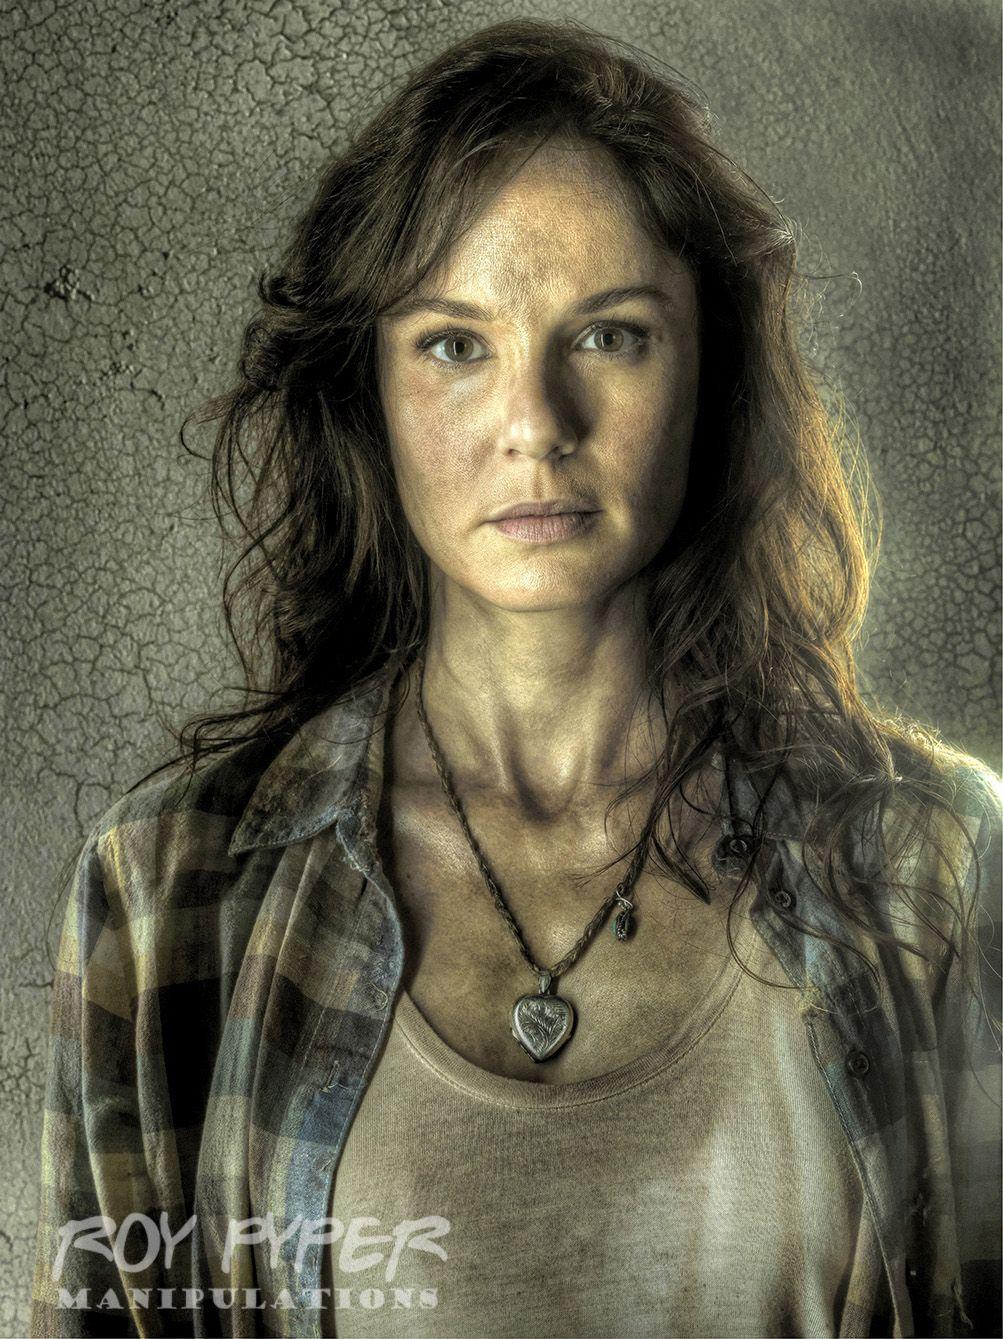 The Walking Dead: Lori: HDR Redux by nerdboy69.deviantart.com on @DeviantArt